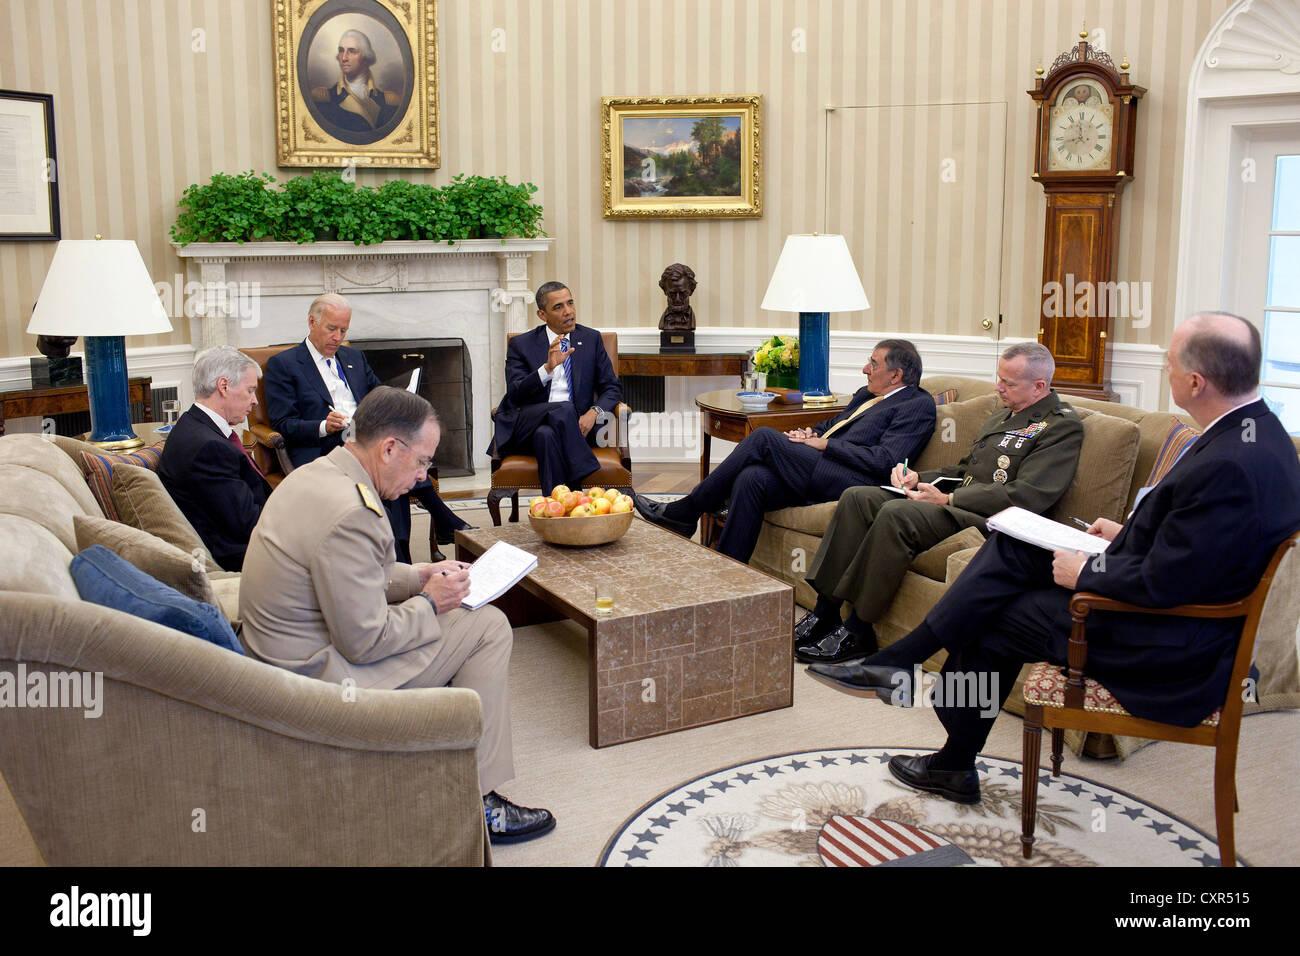 US President Barack Obama and Vice President Joe Biden meet with, clockwise from the President, Defense Secretary - Stock Image